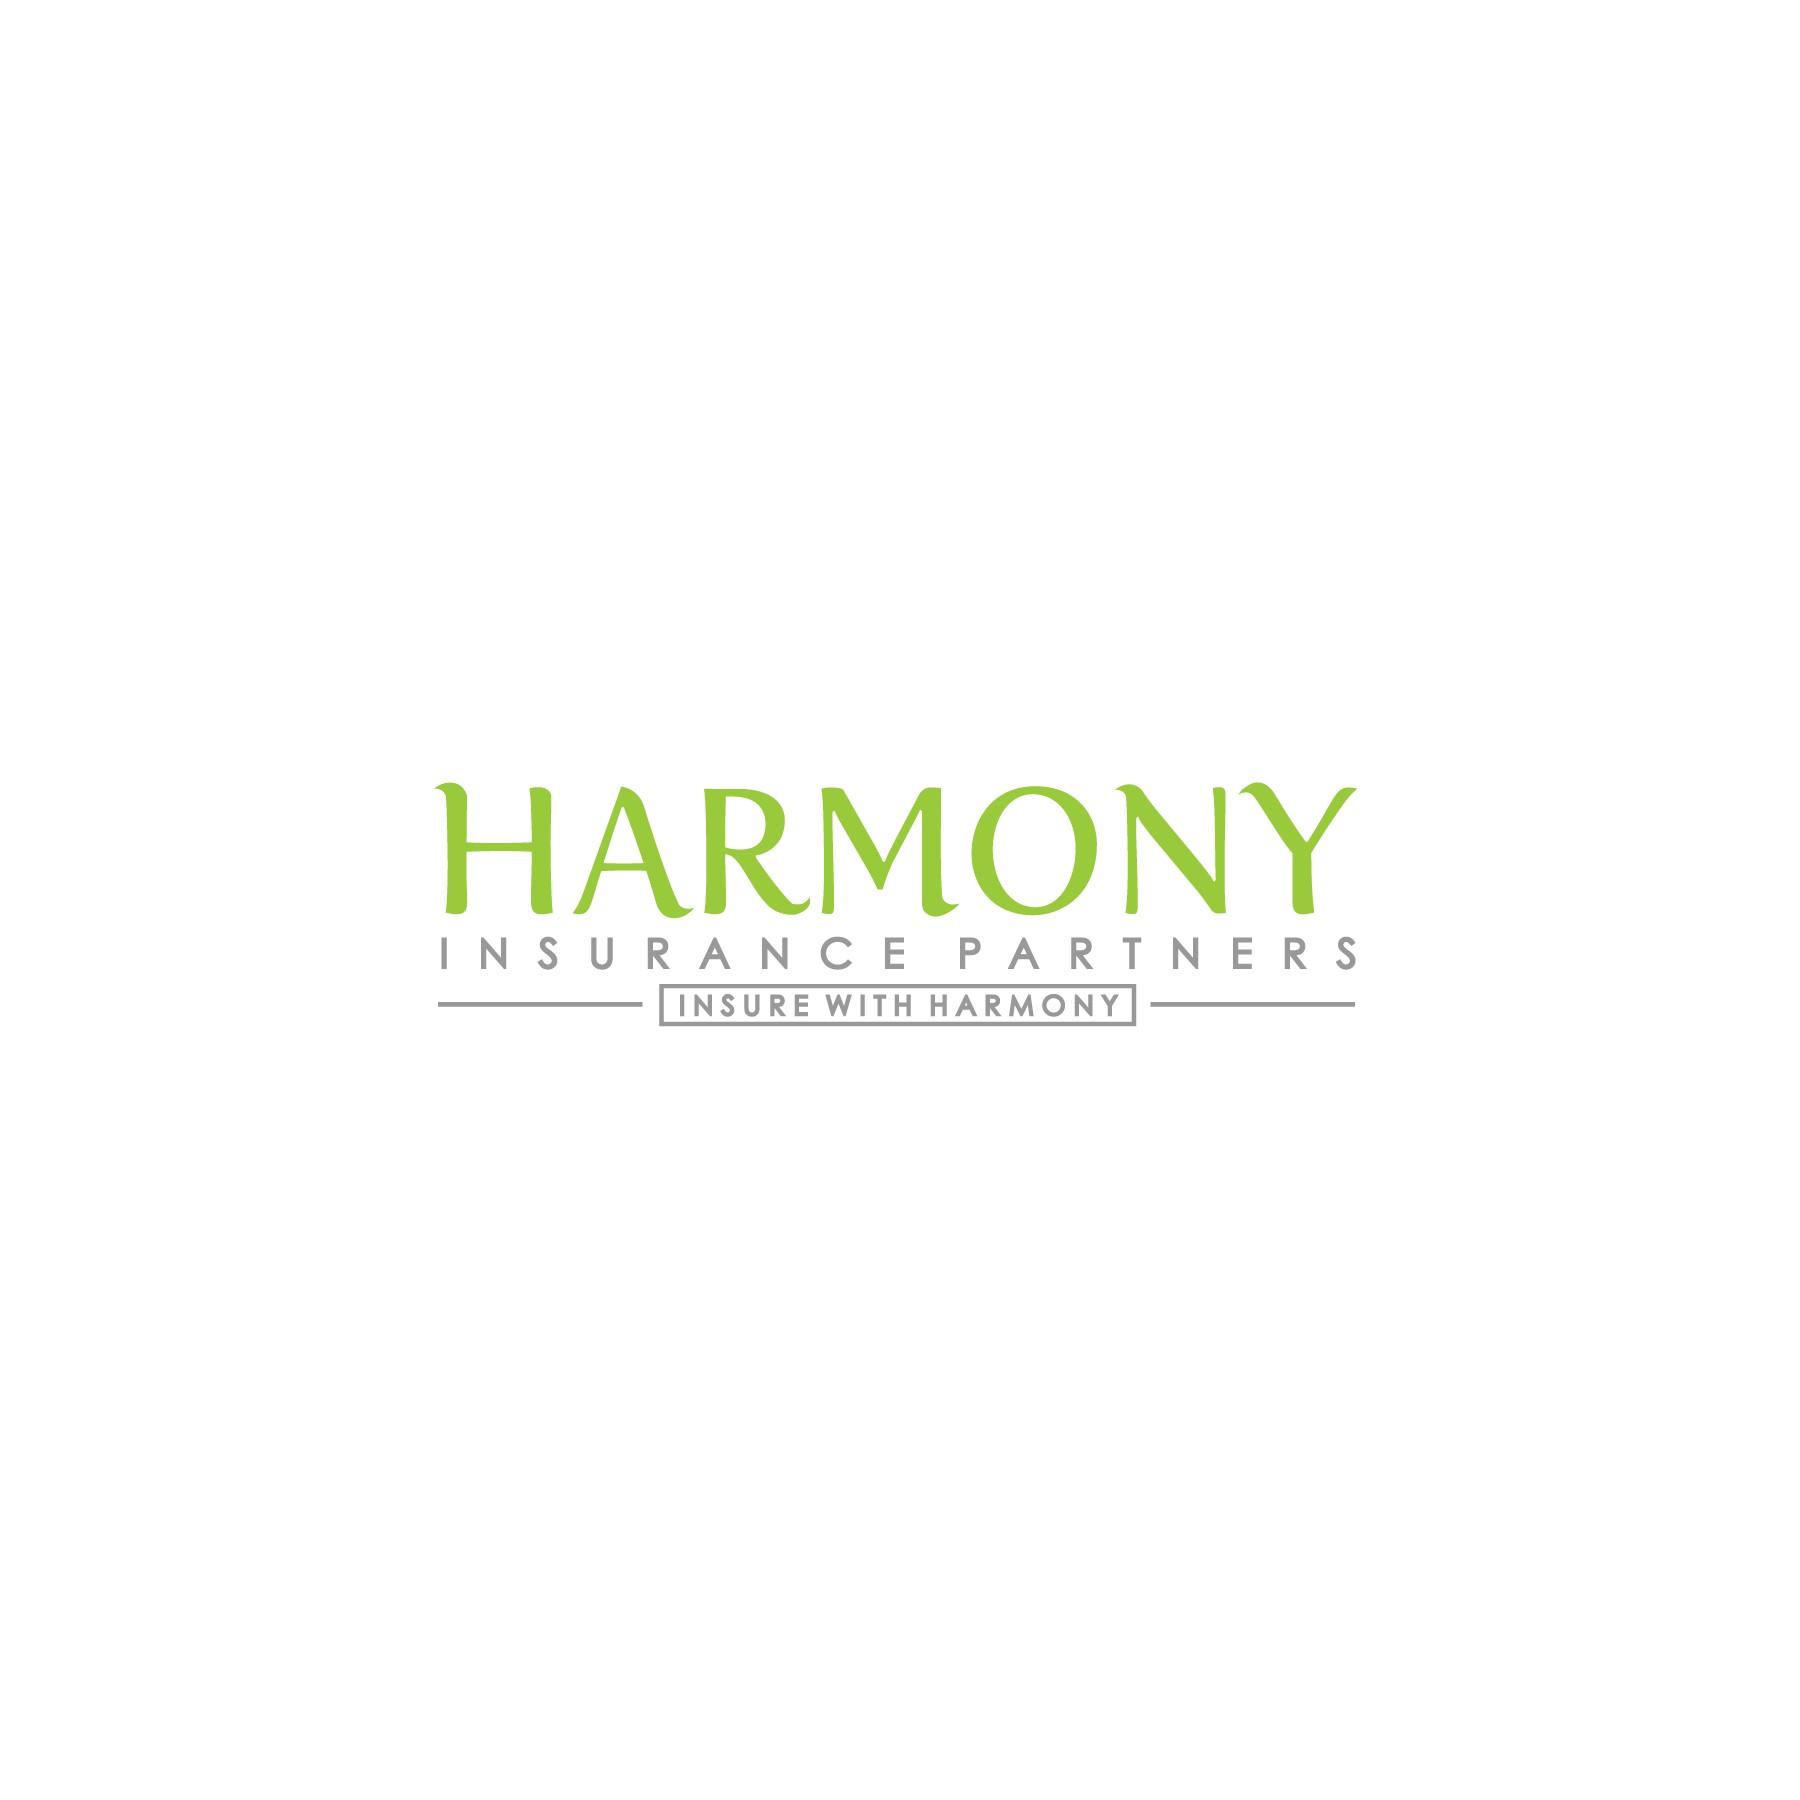 Create a logo for a new insurance agency, Harmony Insurance Partners